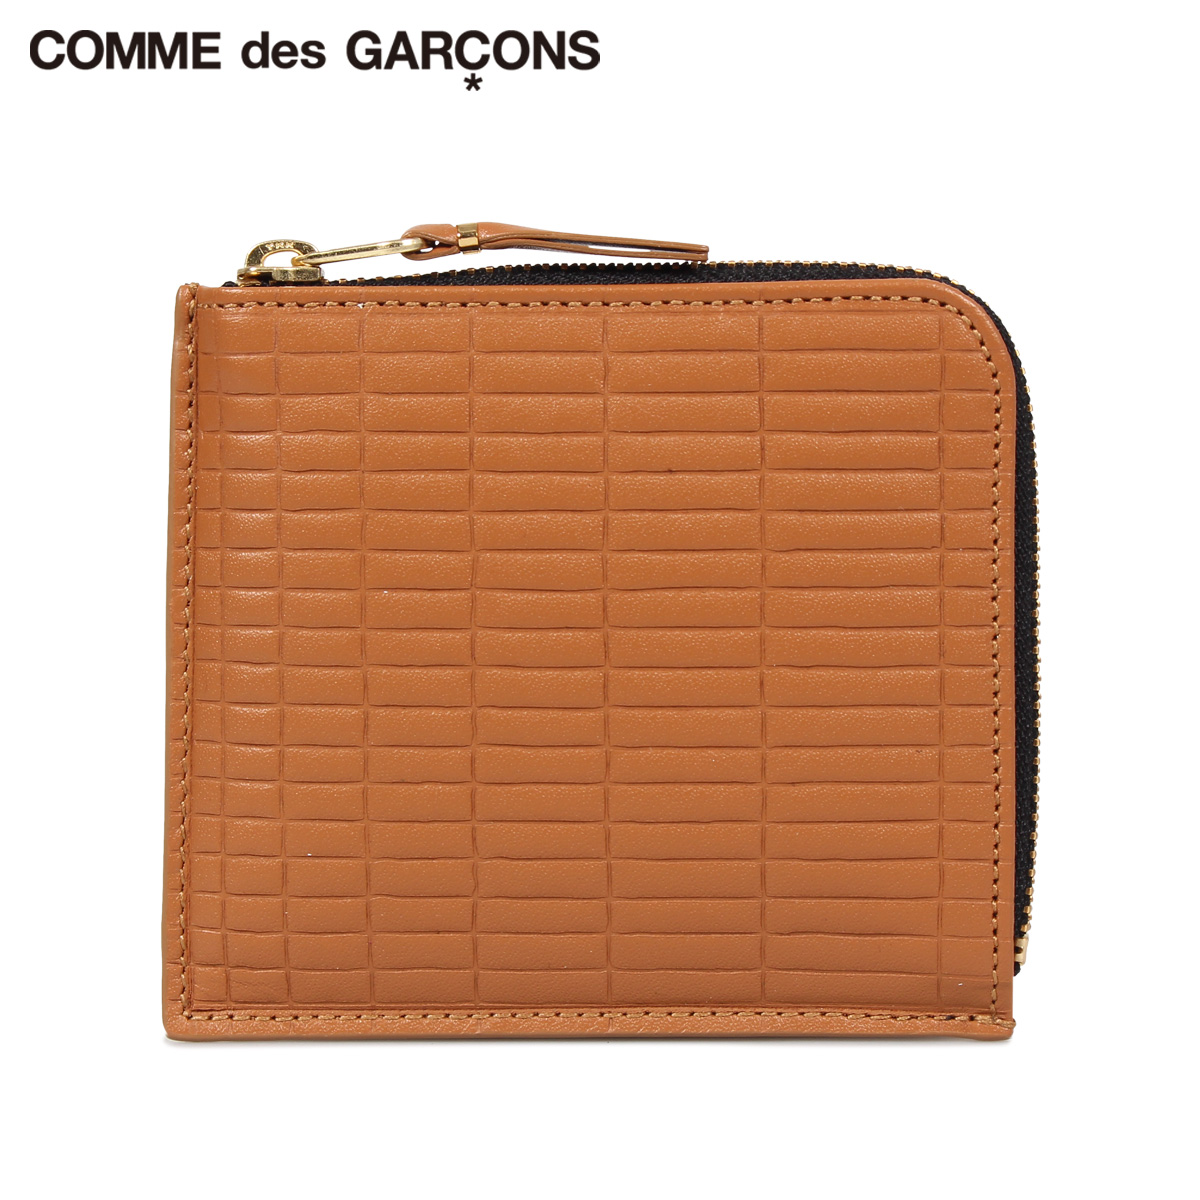 COMME des GARCONS BRICK WALLET コムデギャルソン 財布 ミニ財布 メンズ レディース L字ファスナー 本革 ベージュ SA3100BK [10/10 新入荷]